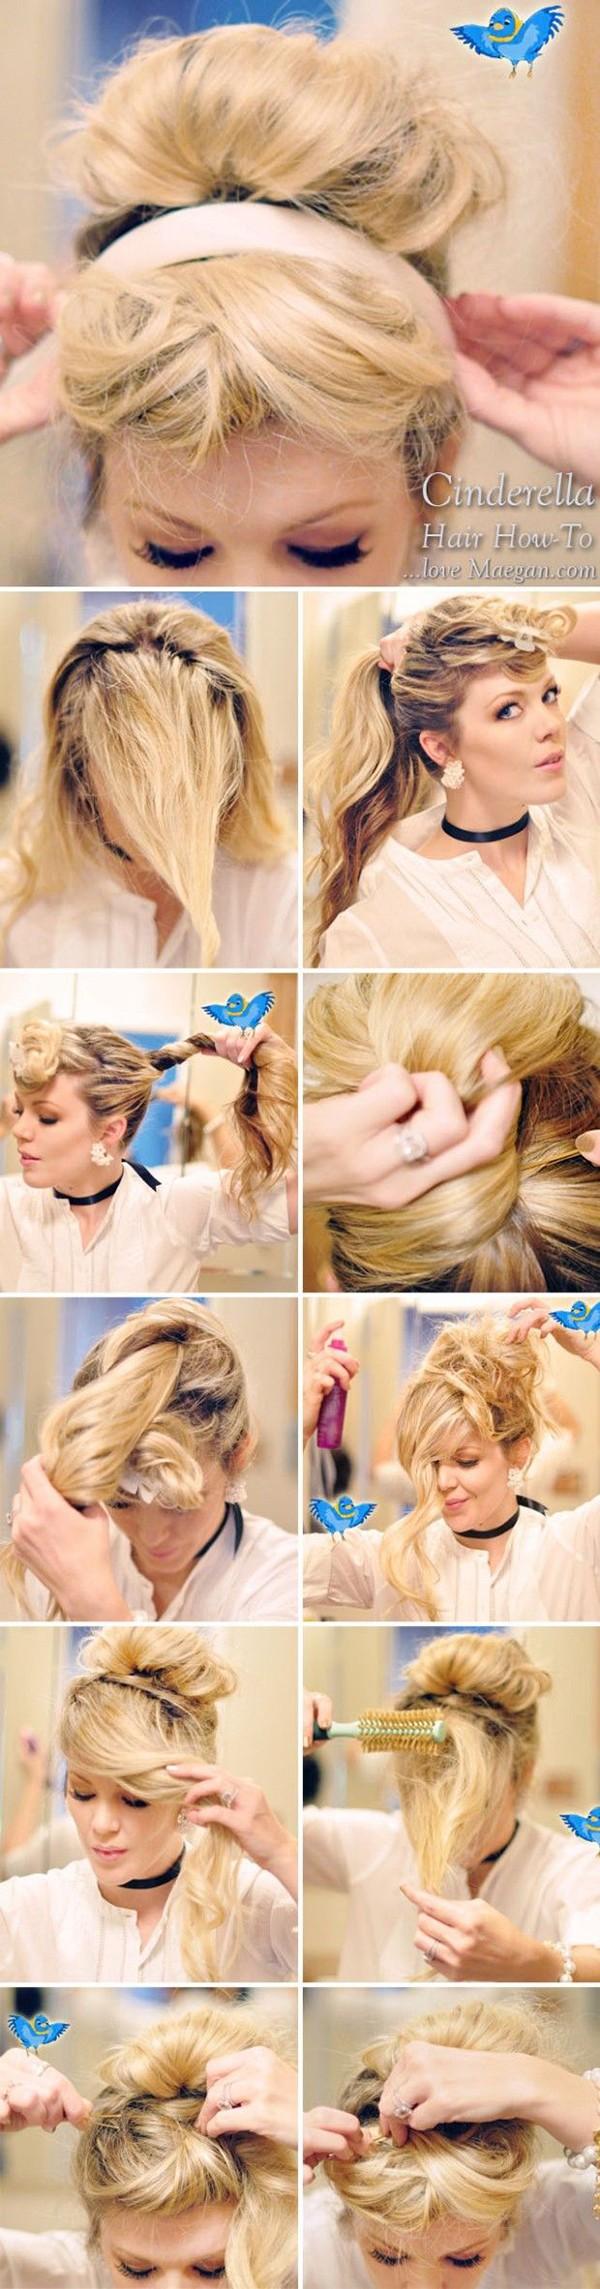 princesa hairstyle5